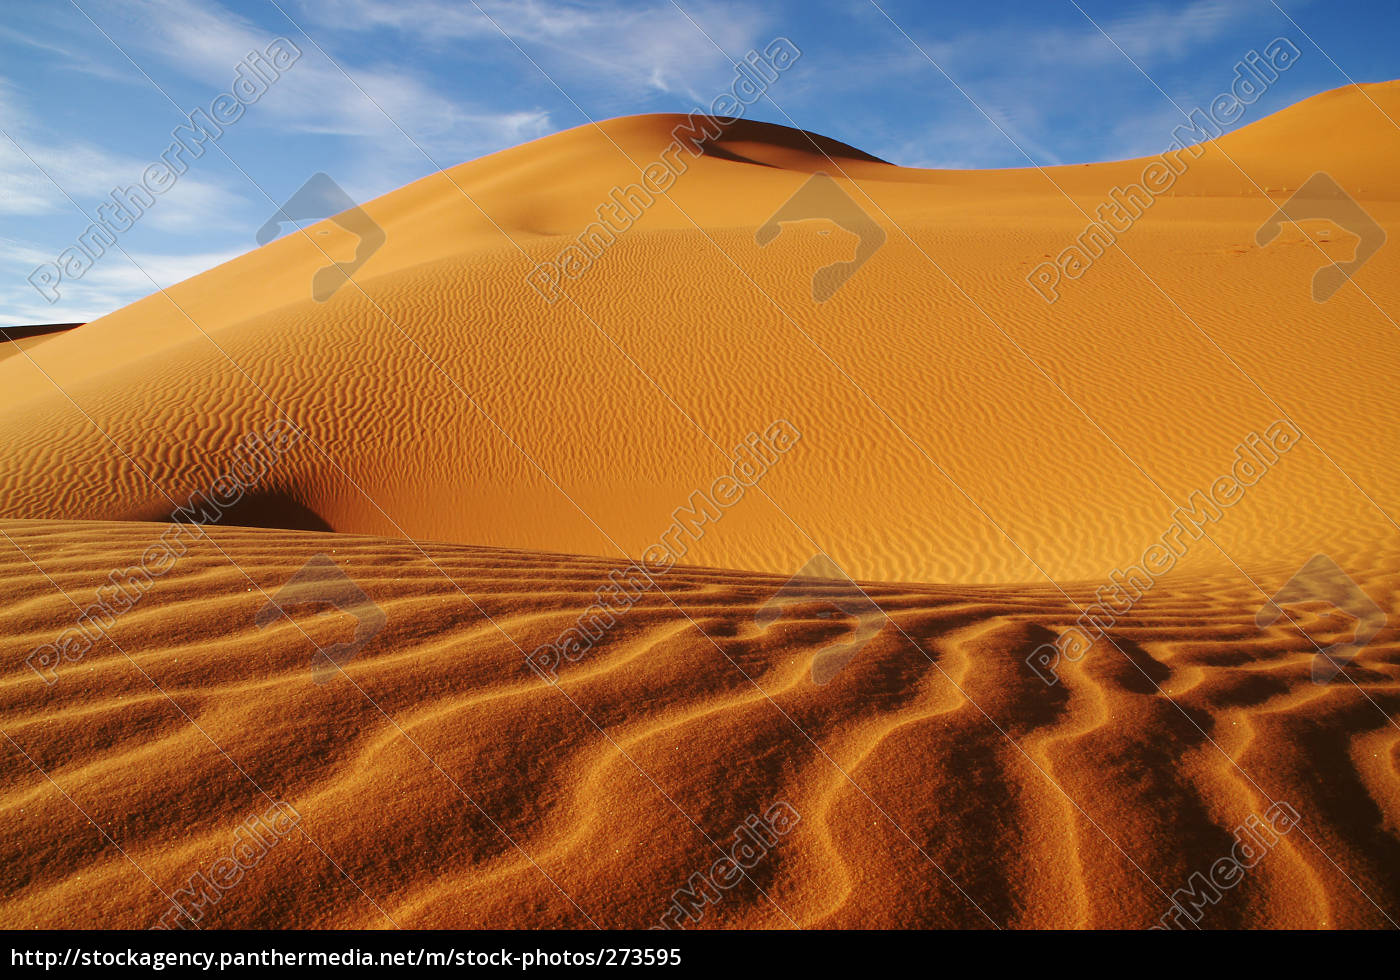 sand, pattern - 273595